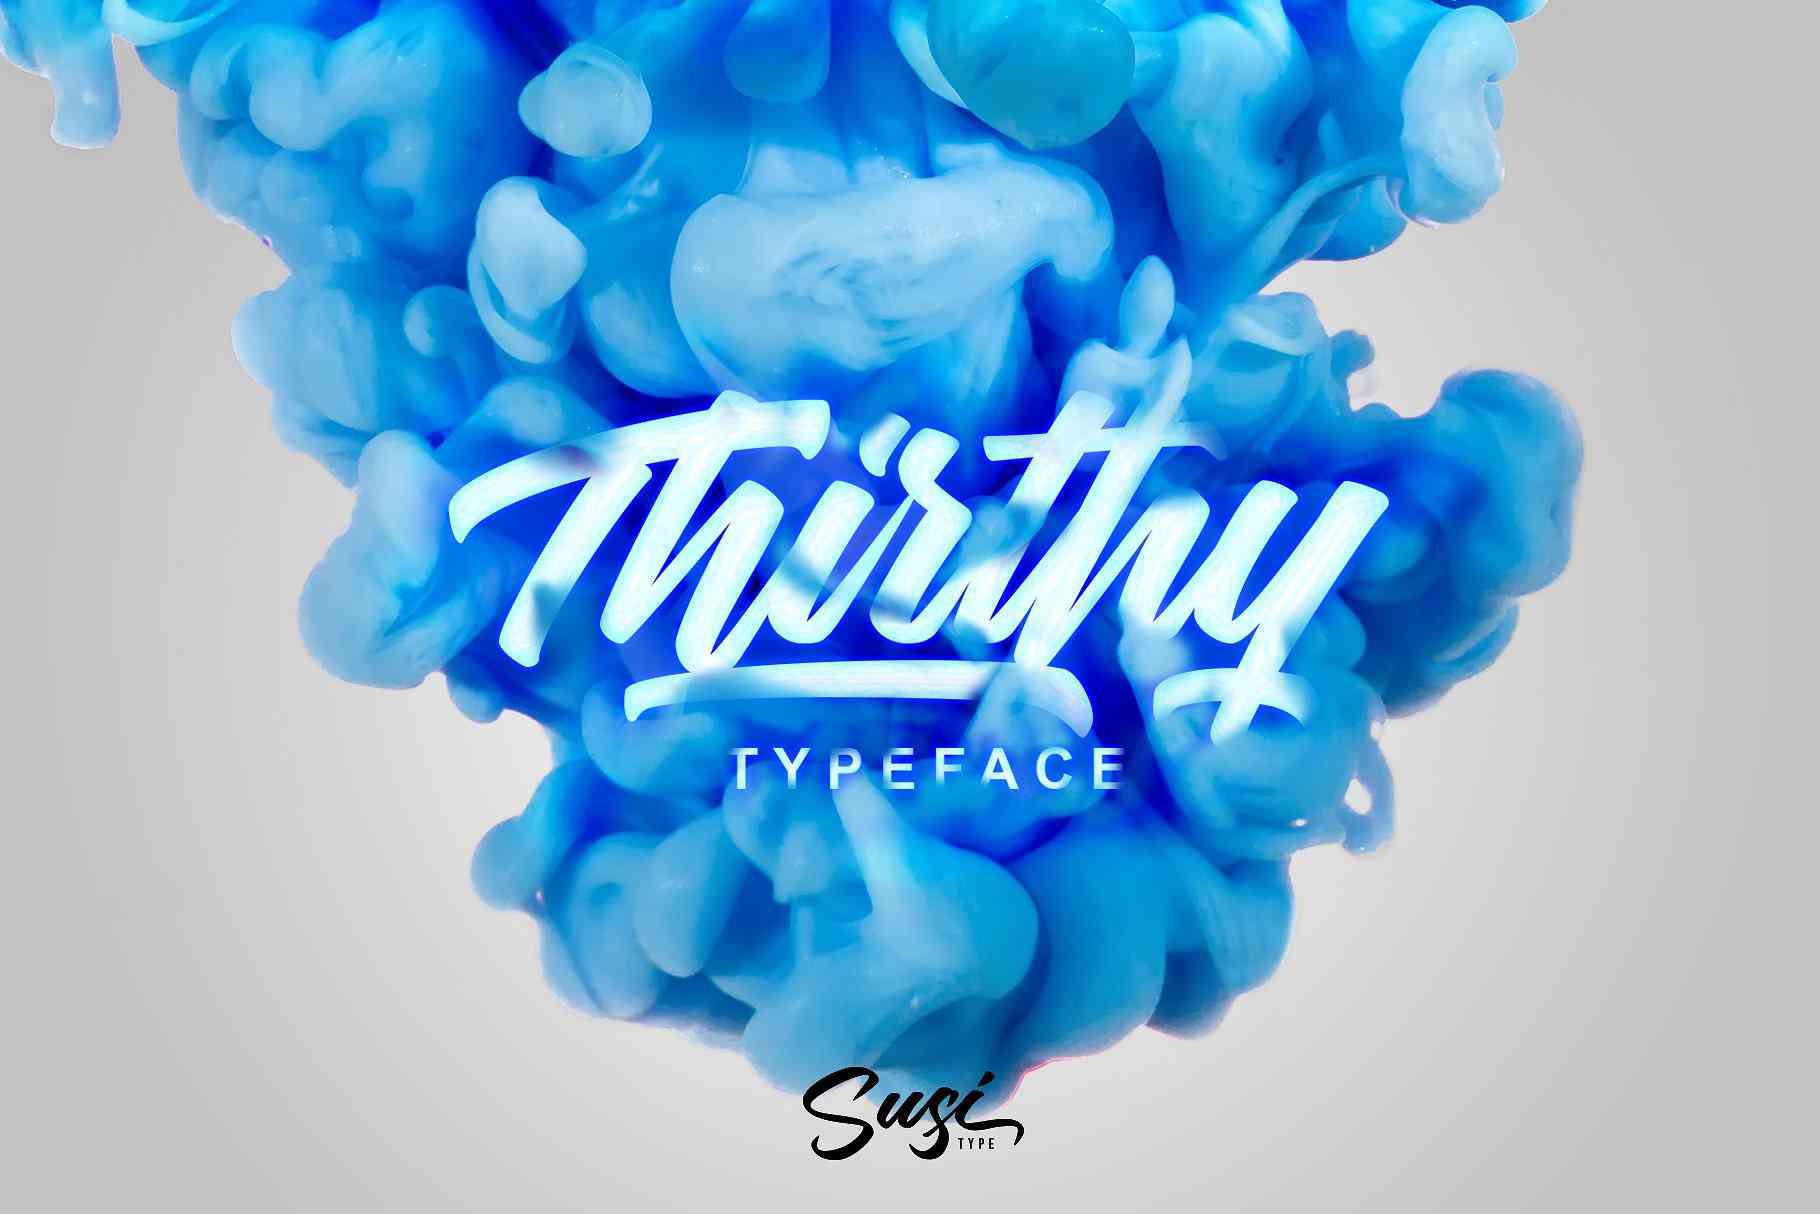 thirthy-typeface